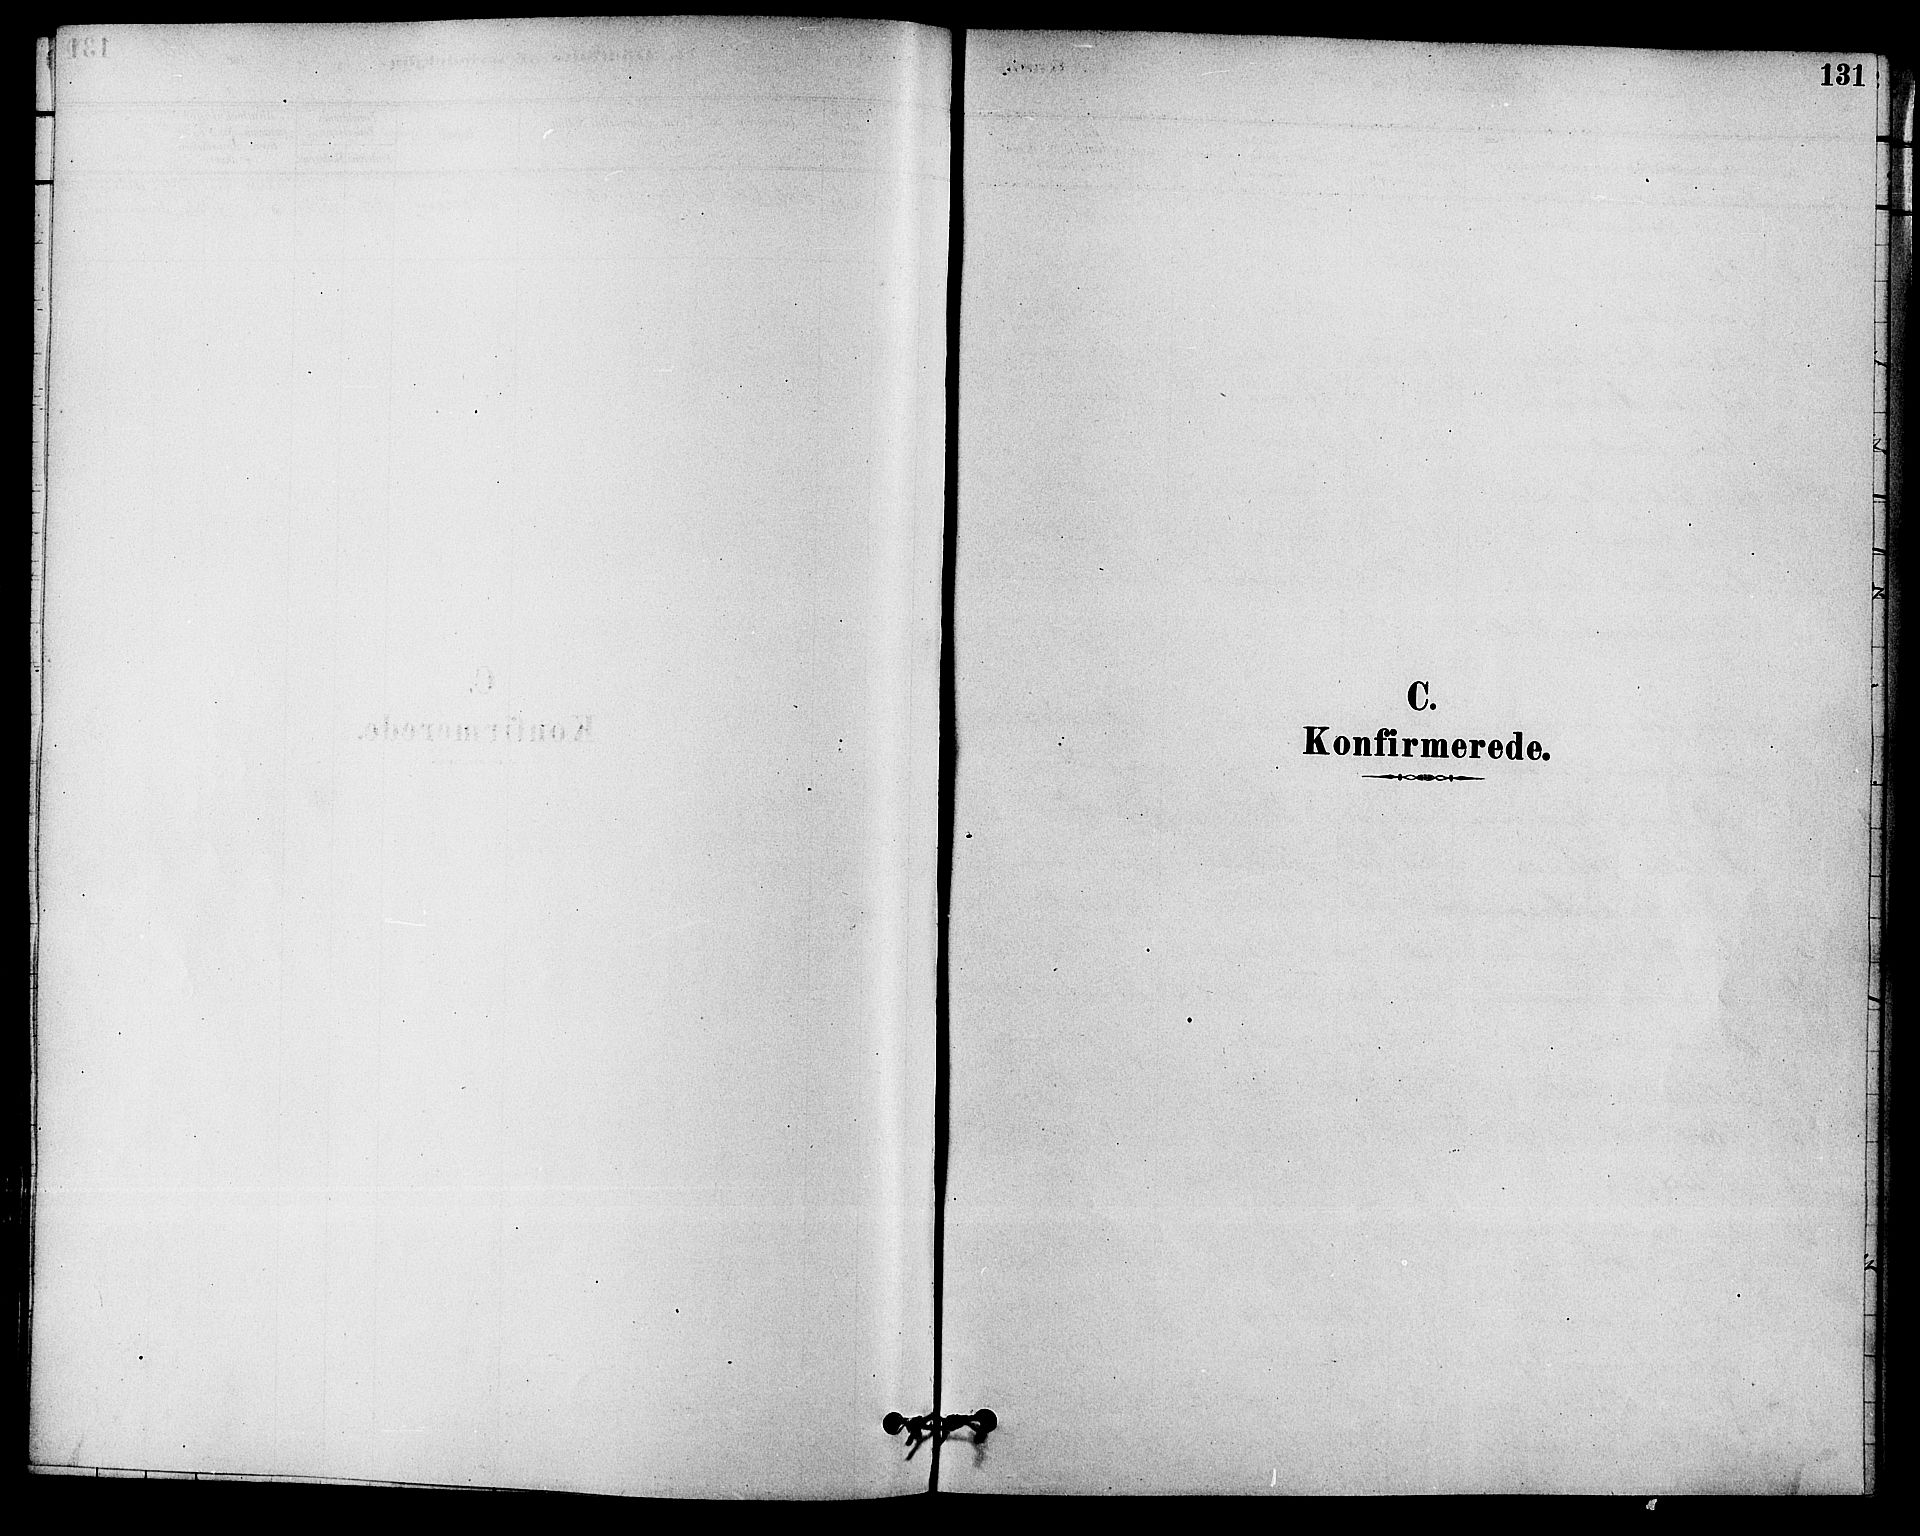 SAKO, Solum kirkebøker, F/Fa/L0009: Ministerialbok nr. I 9, 1877-1887, s. 131